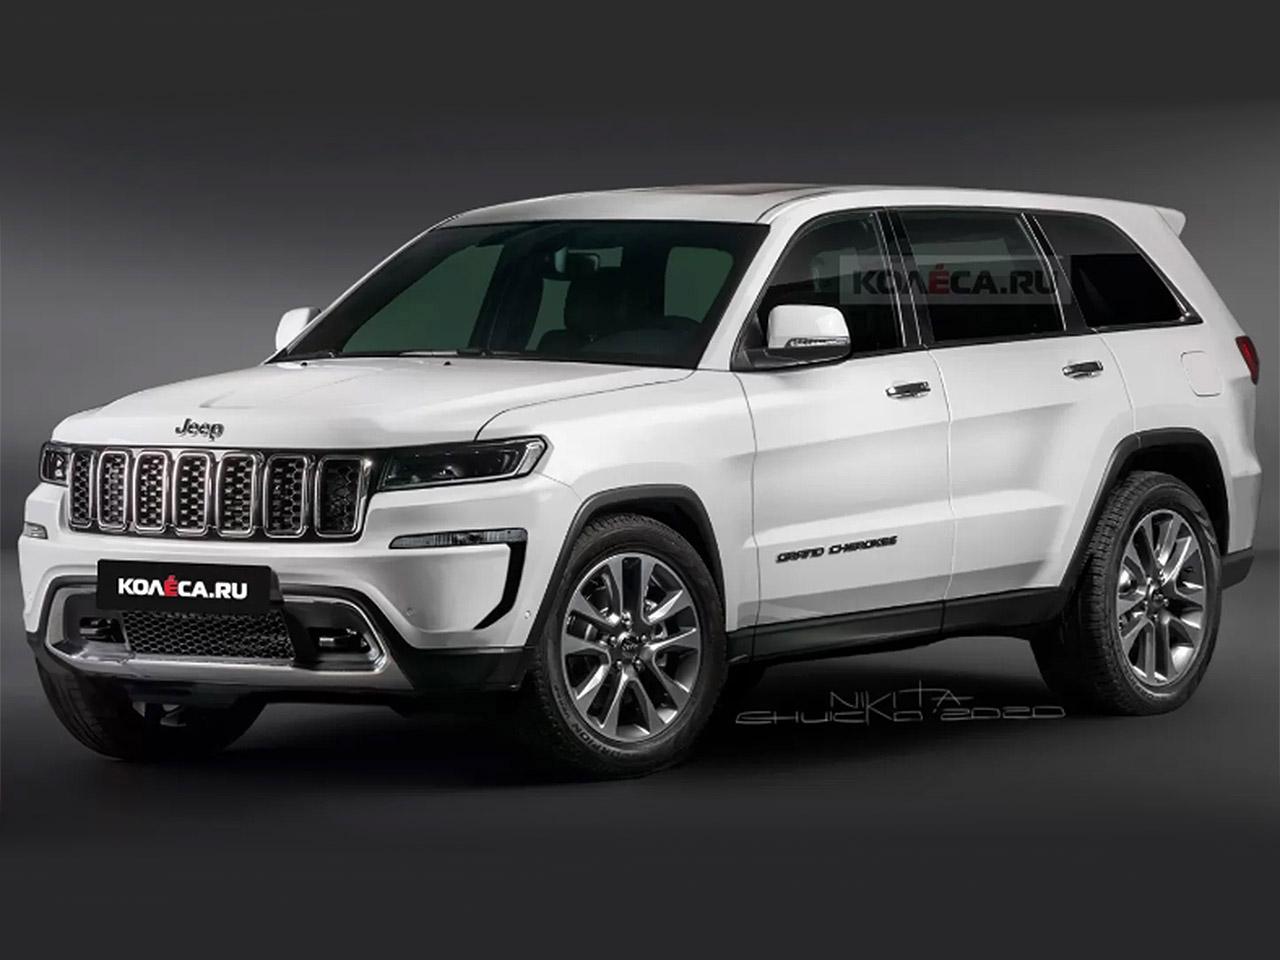 Jeep Grand Cherokee 2021 Projeção Kolesa Rússia 2